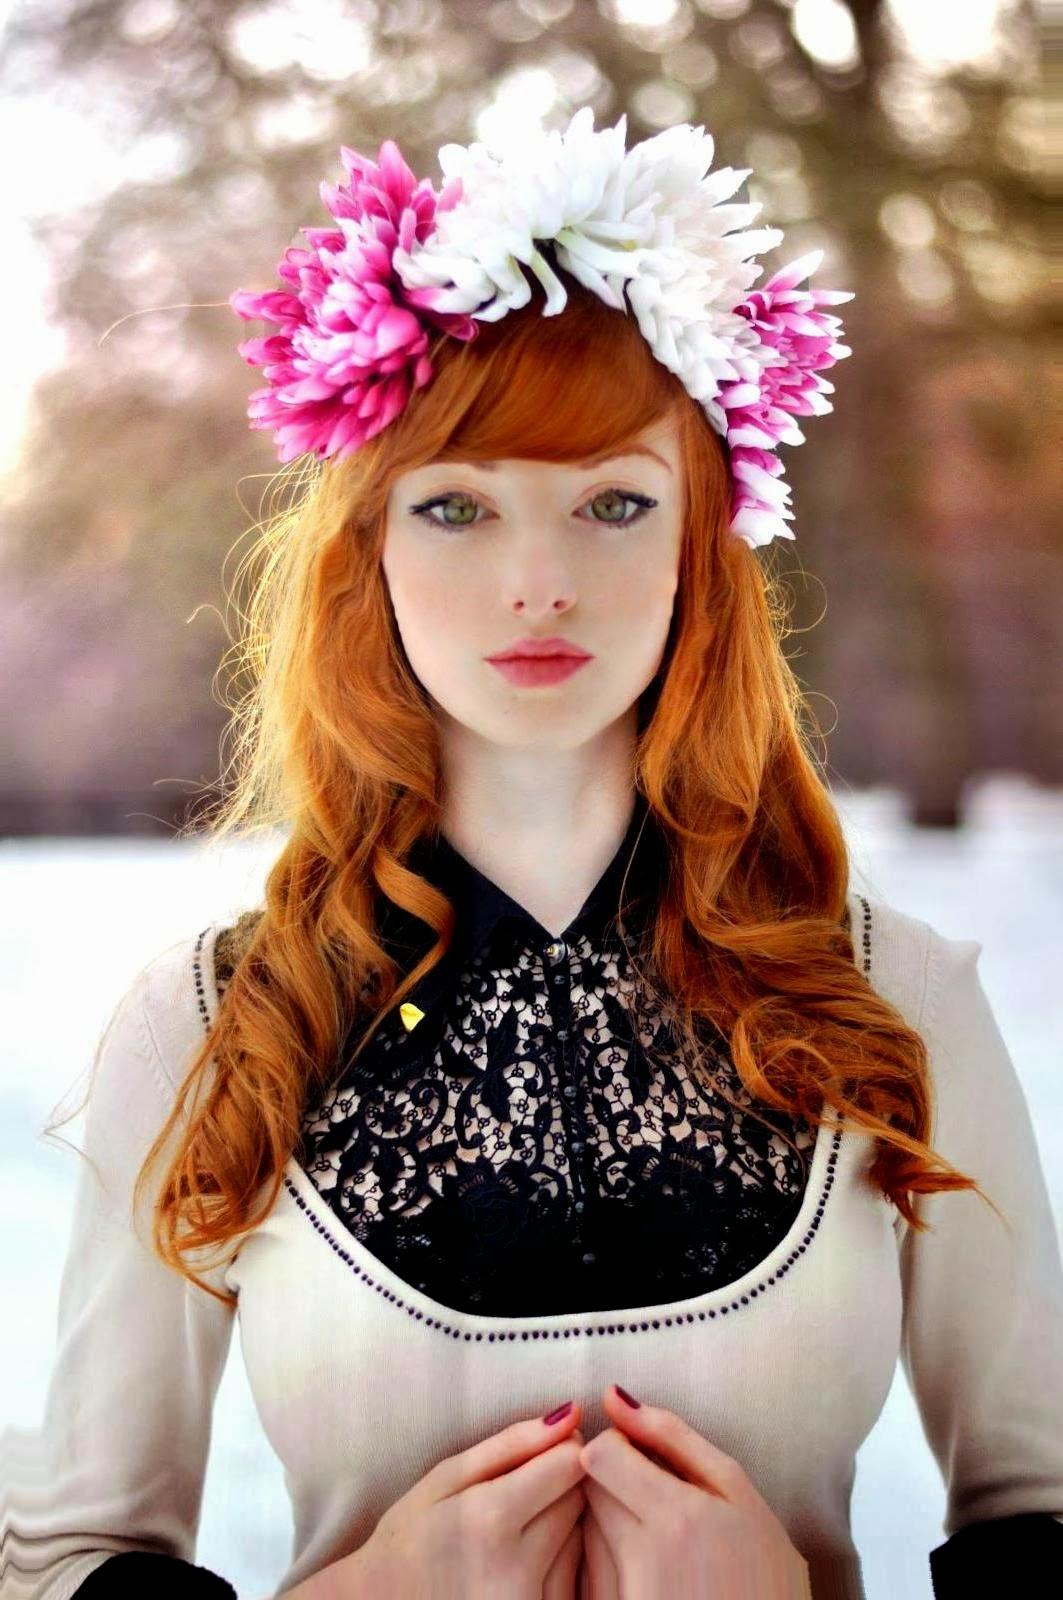 Buy Tyelna masha model profile picture trends